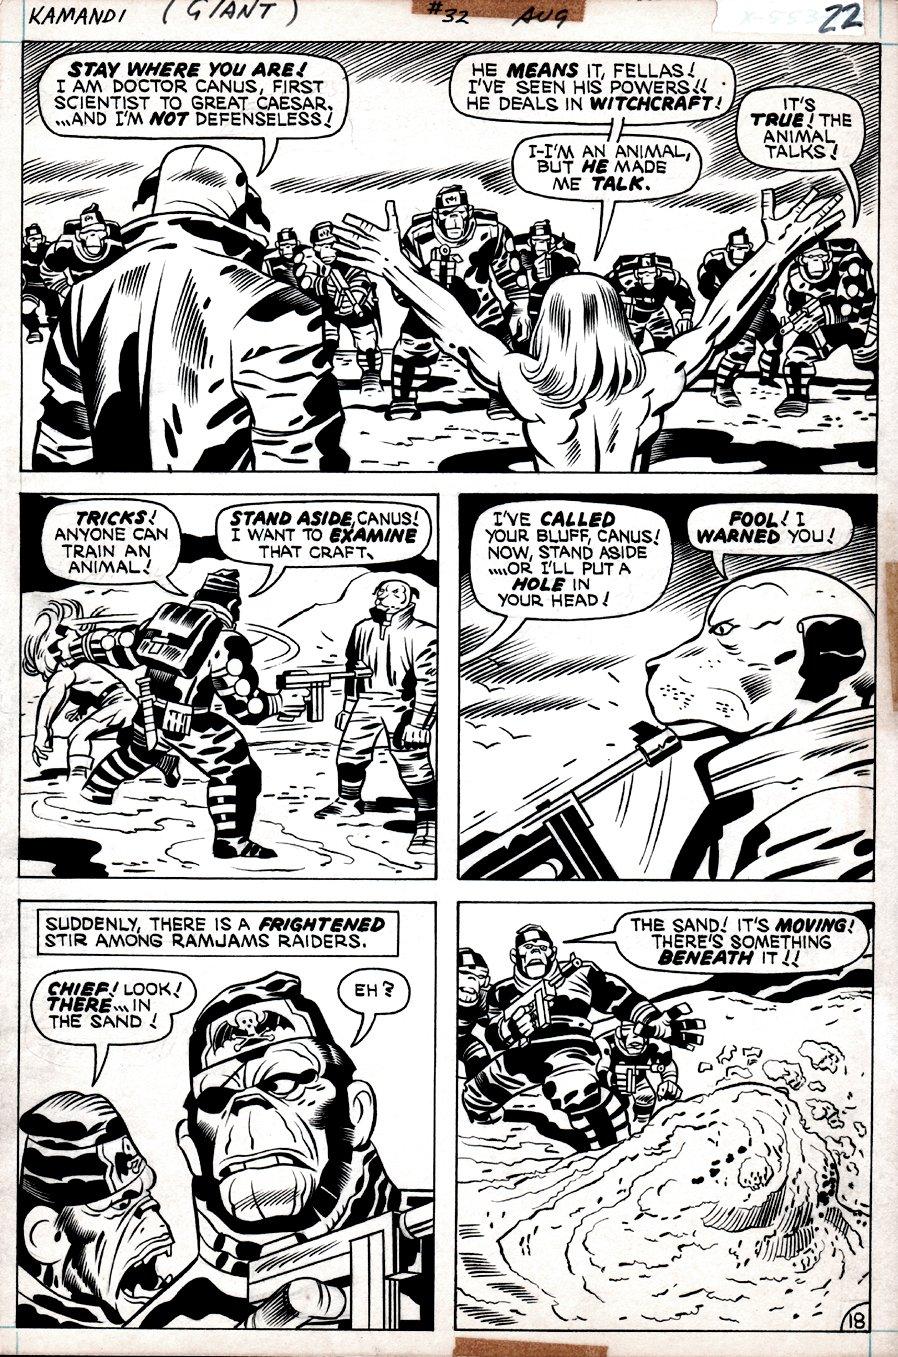 Kamandi #32 p 18  (Kamandi, Dr. Canus, Gorilla Commandos!) 1975